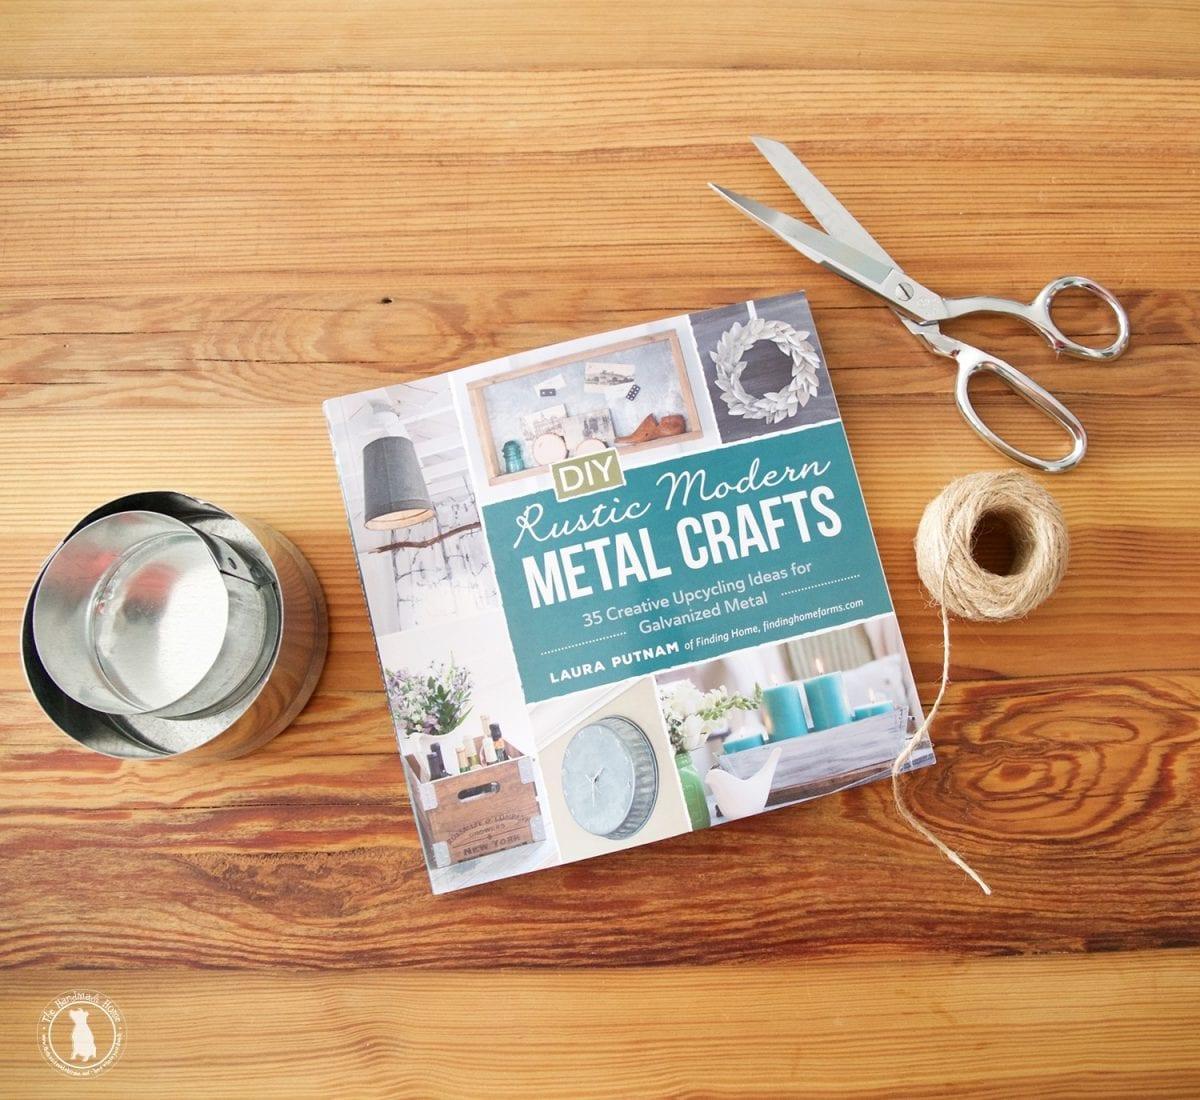 rustic_modern_metal_crafts